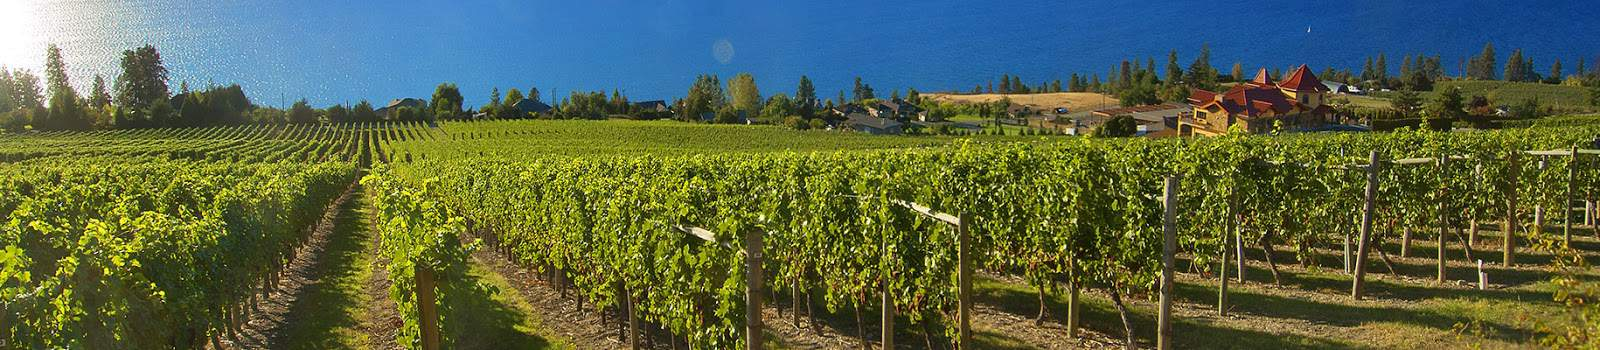 Grey Monk Winery in Lake Country - Photo Cred: Predator Ridge